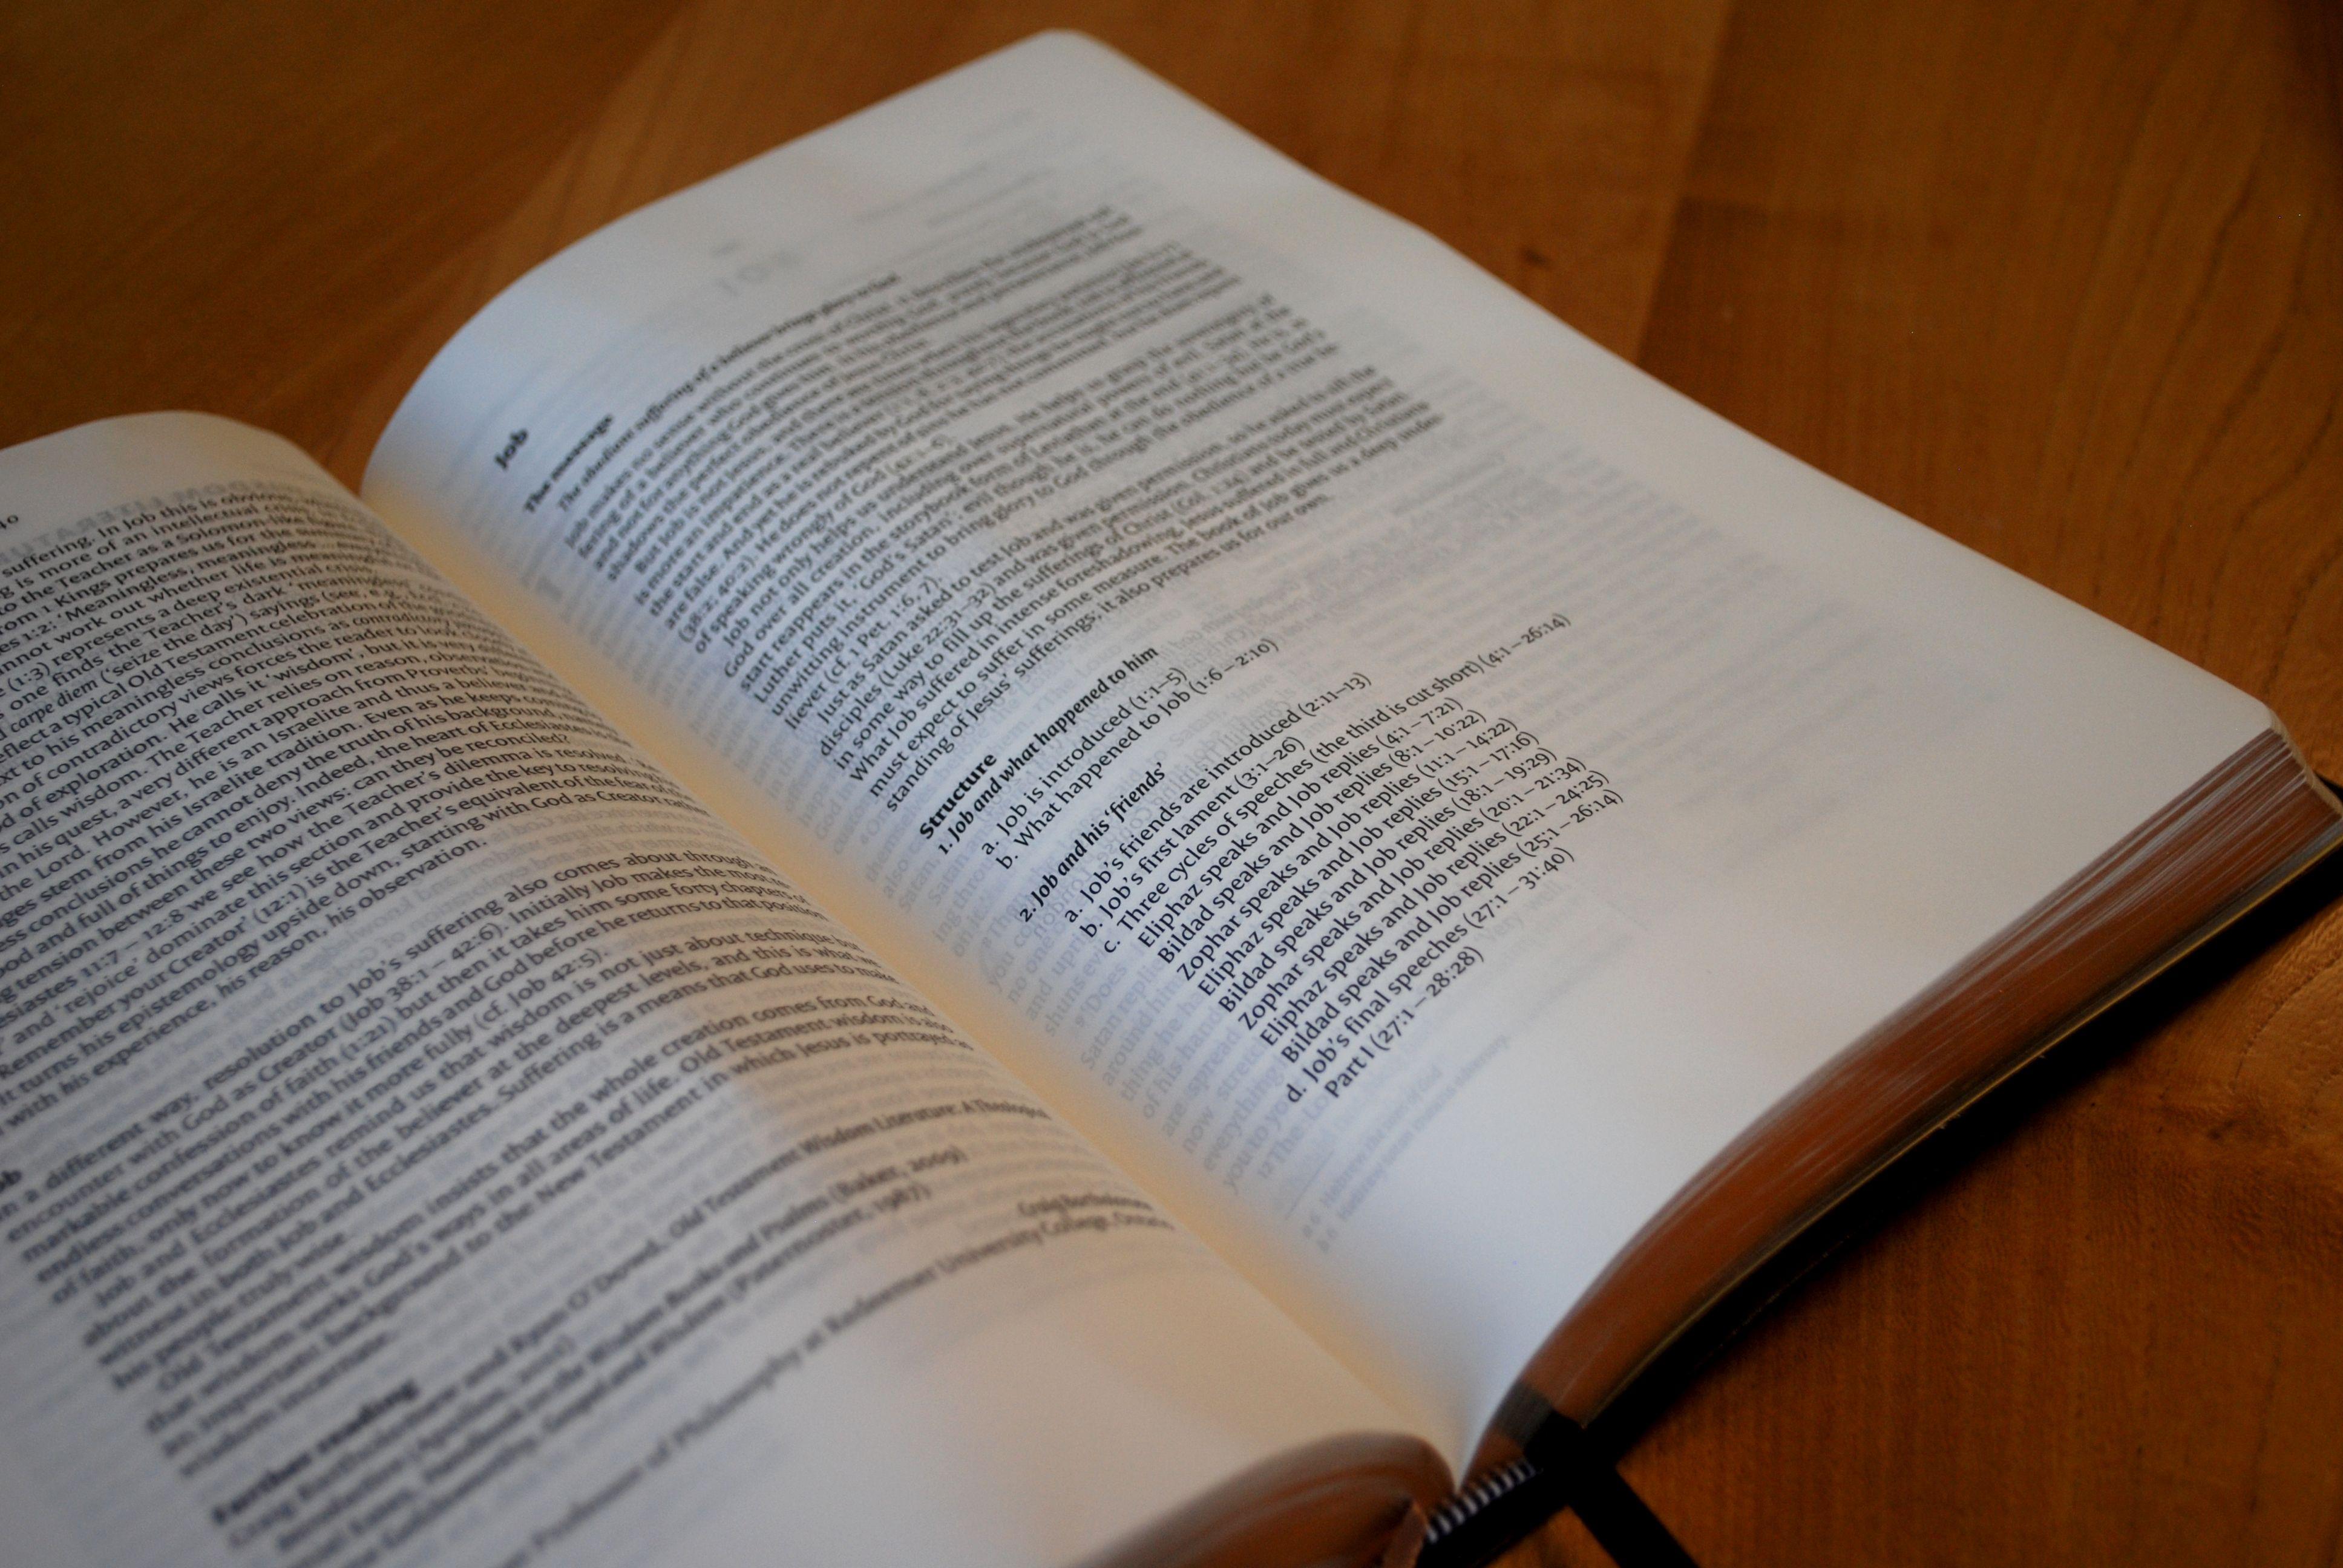 NIV Proclamation Bible (Leather) 9781444745610 £42.99